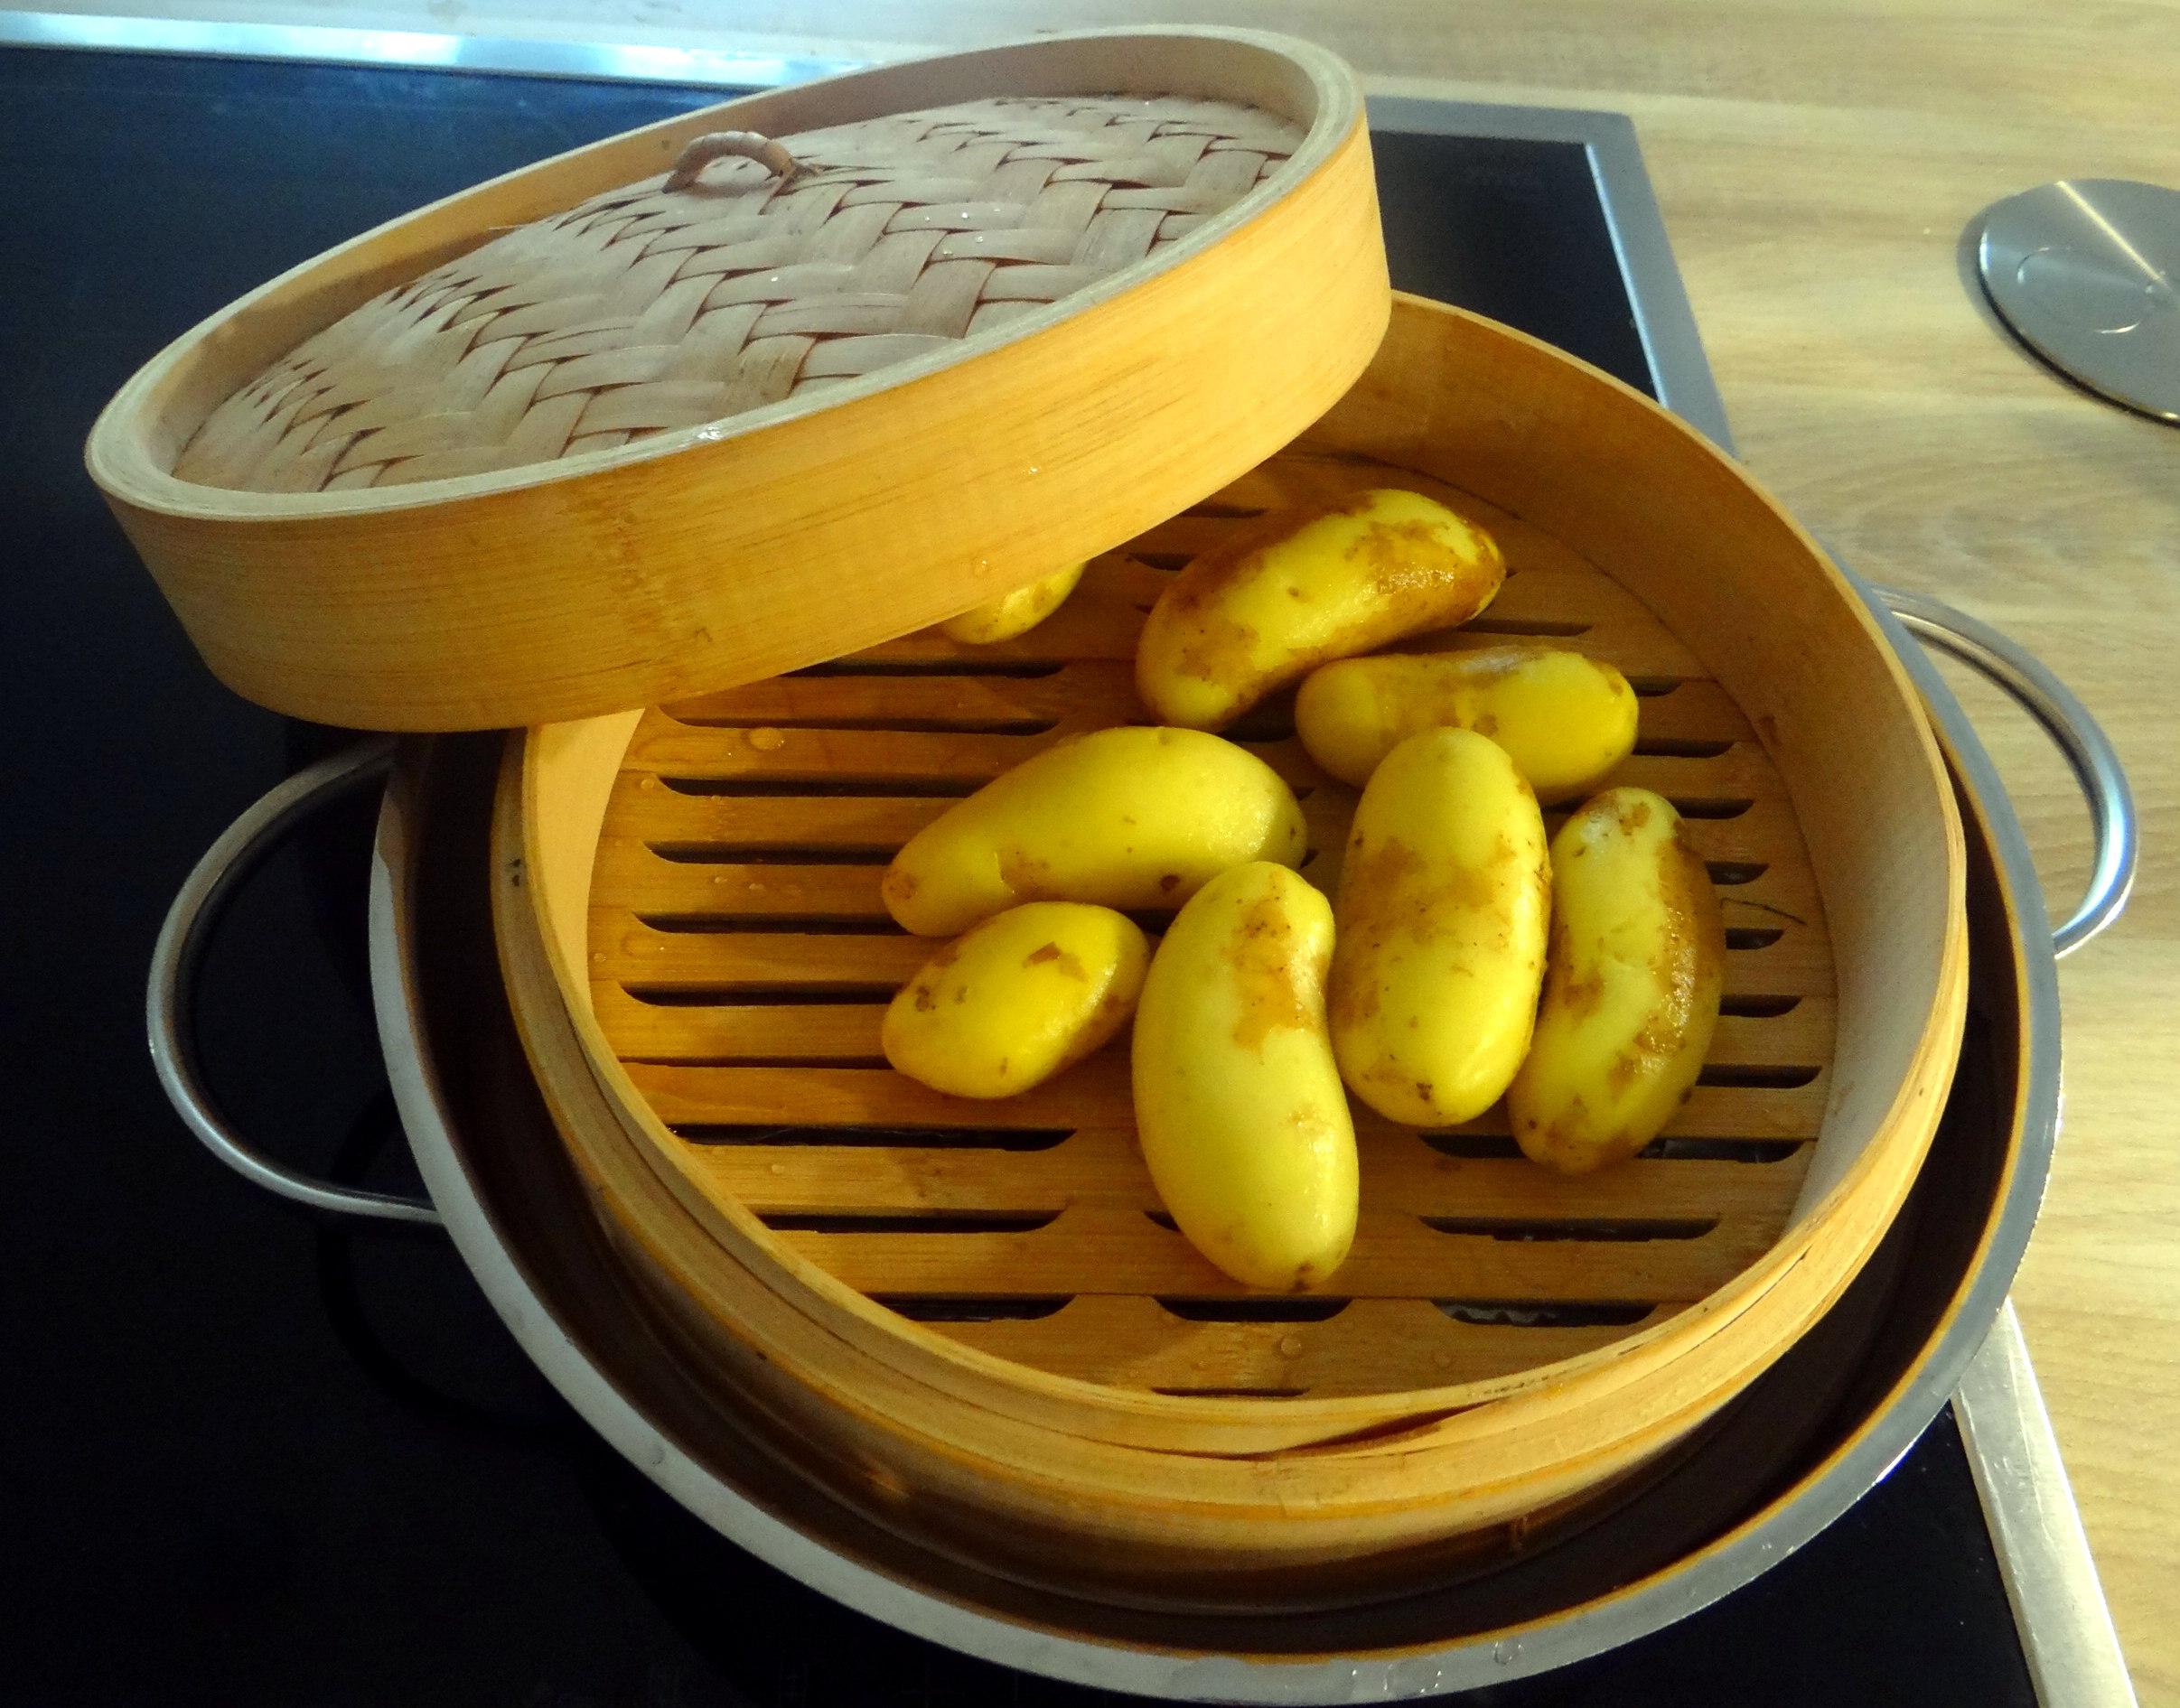 Spargel aus dem Ofen,Pellkartoffeln,Obstsalat (5)